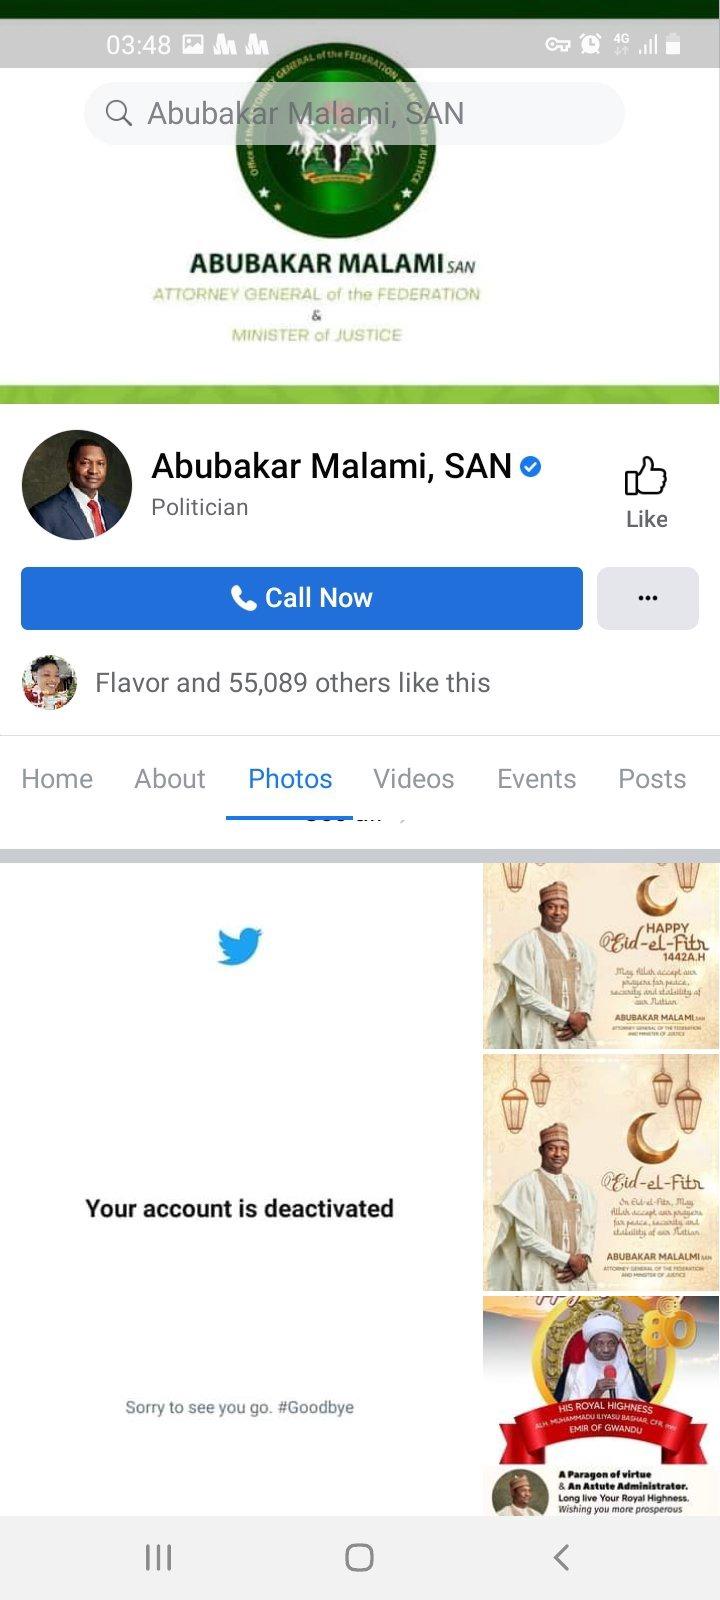 Abubakar Malami deactivates his twitter account